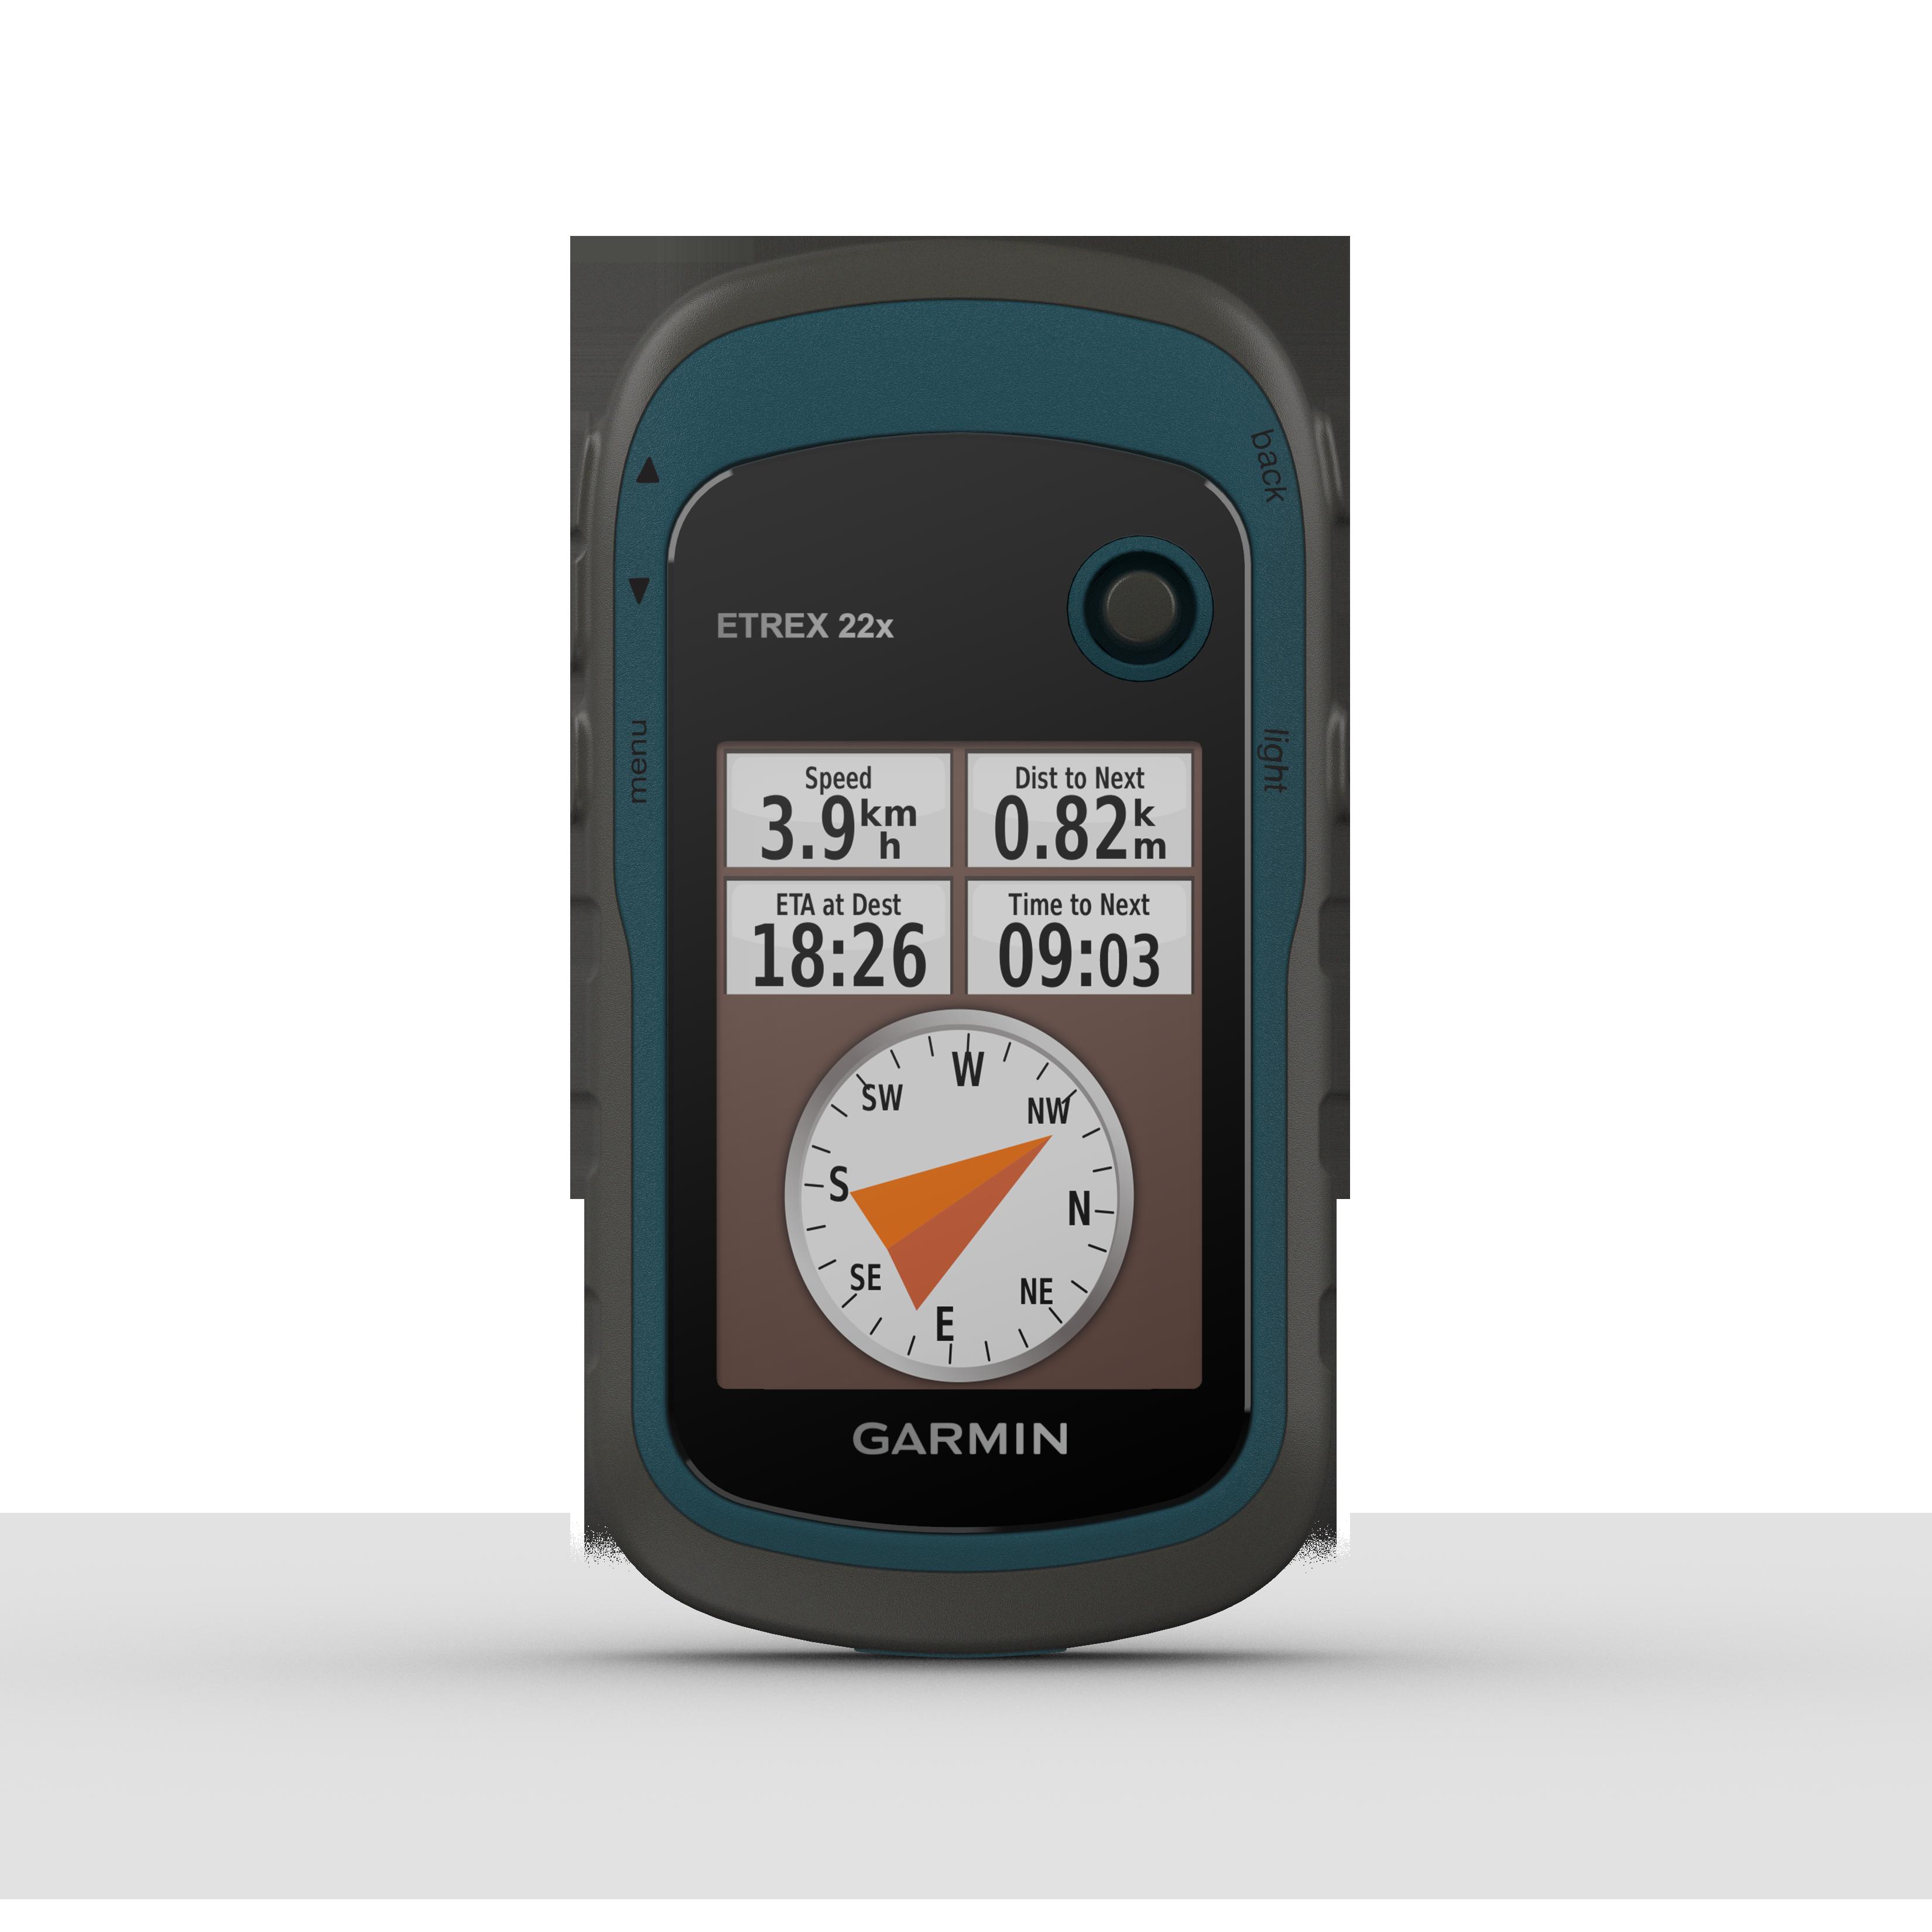 GARMIN (IE) | WAAS-enabled GPS Receiver | eTrex 22x